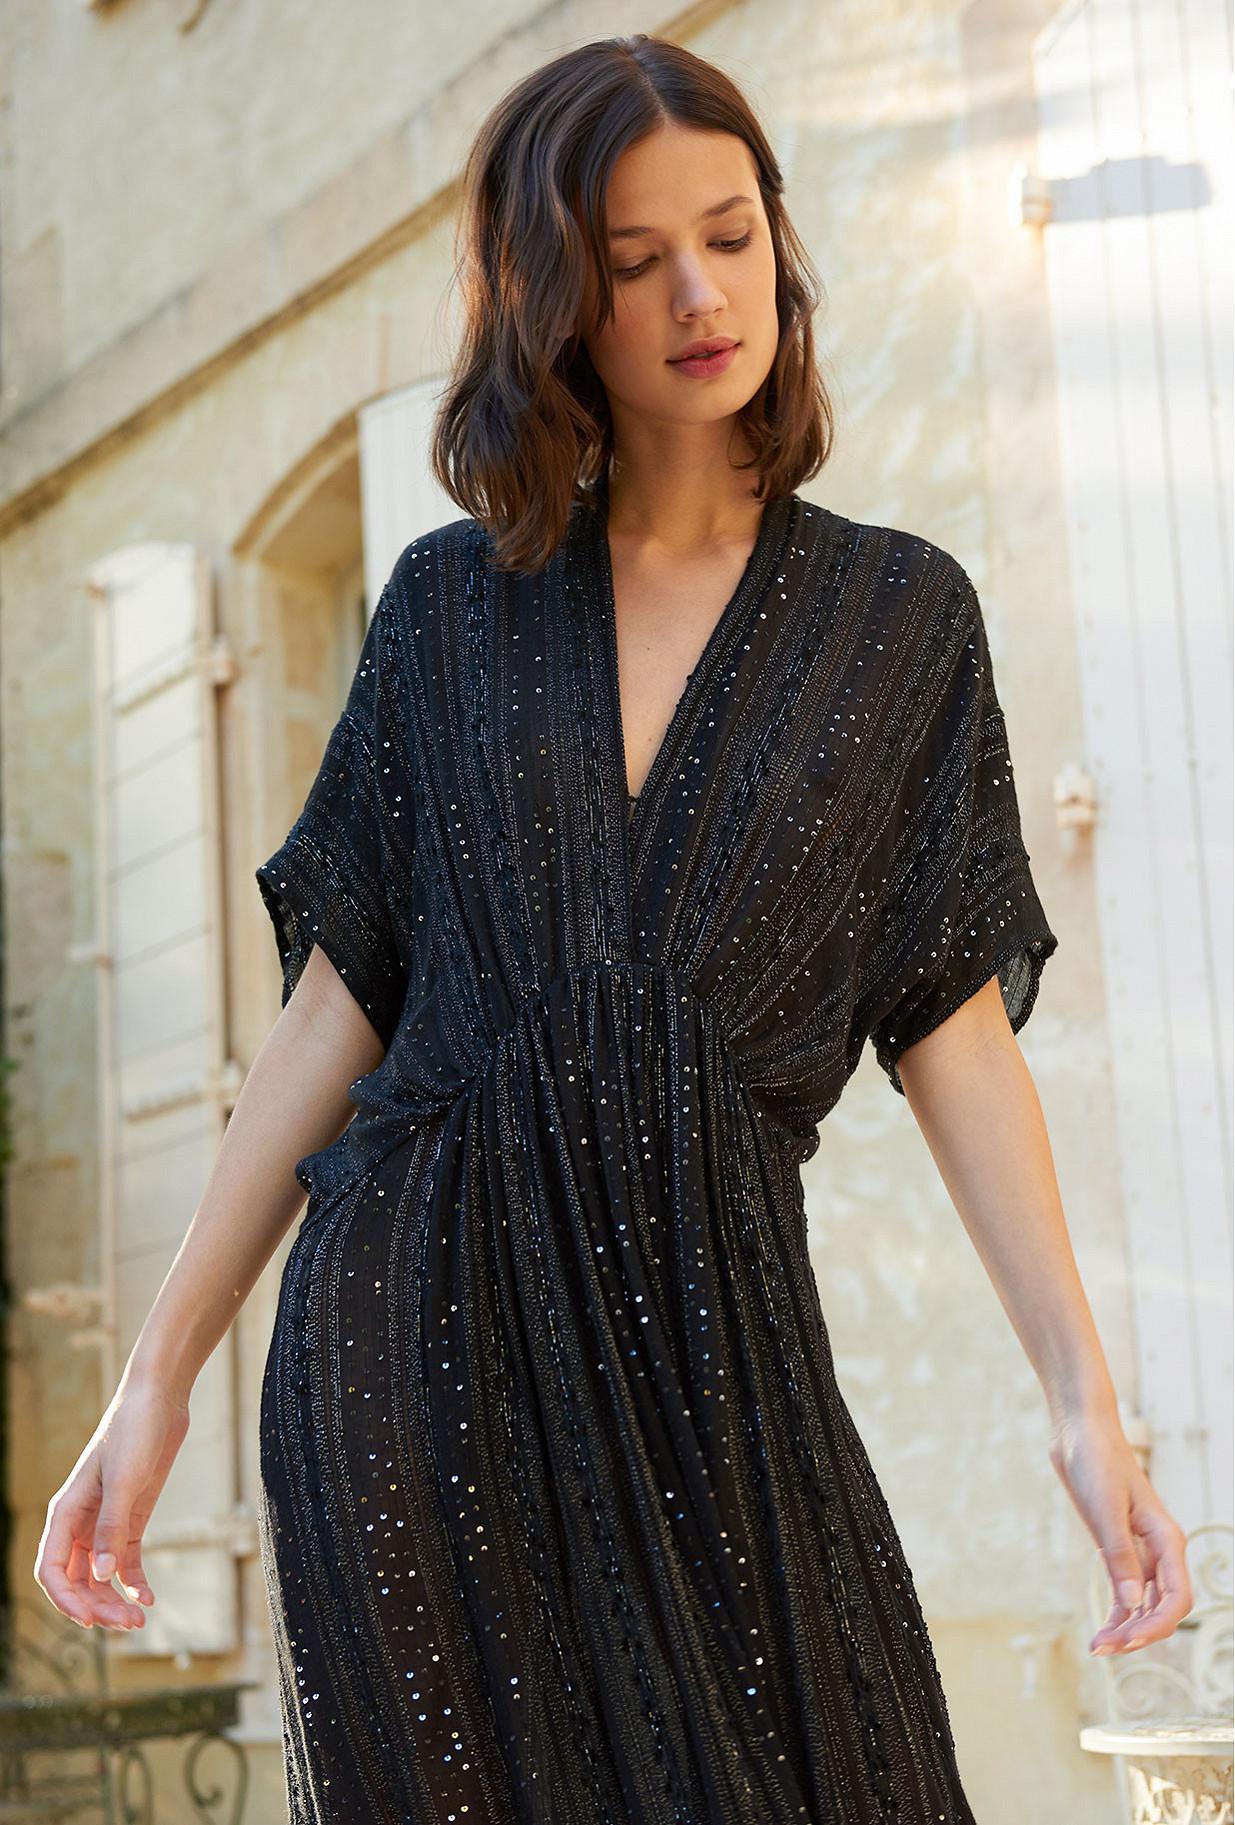 Black  Dress  Samsara Mes demoiselles fashion clothes designer Paris